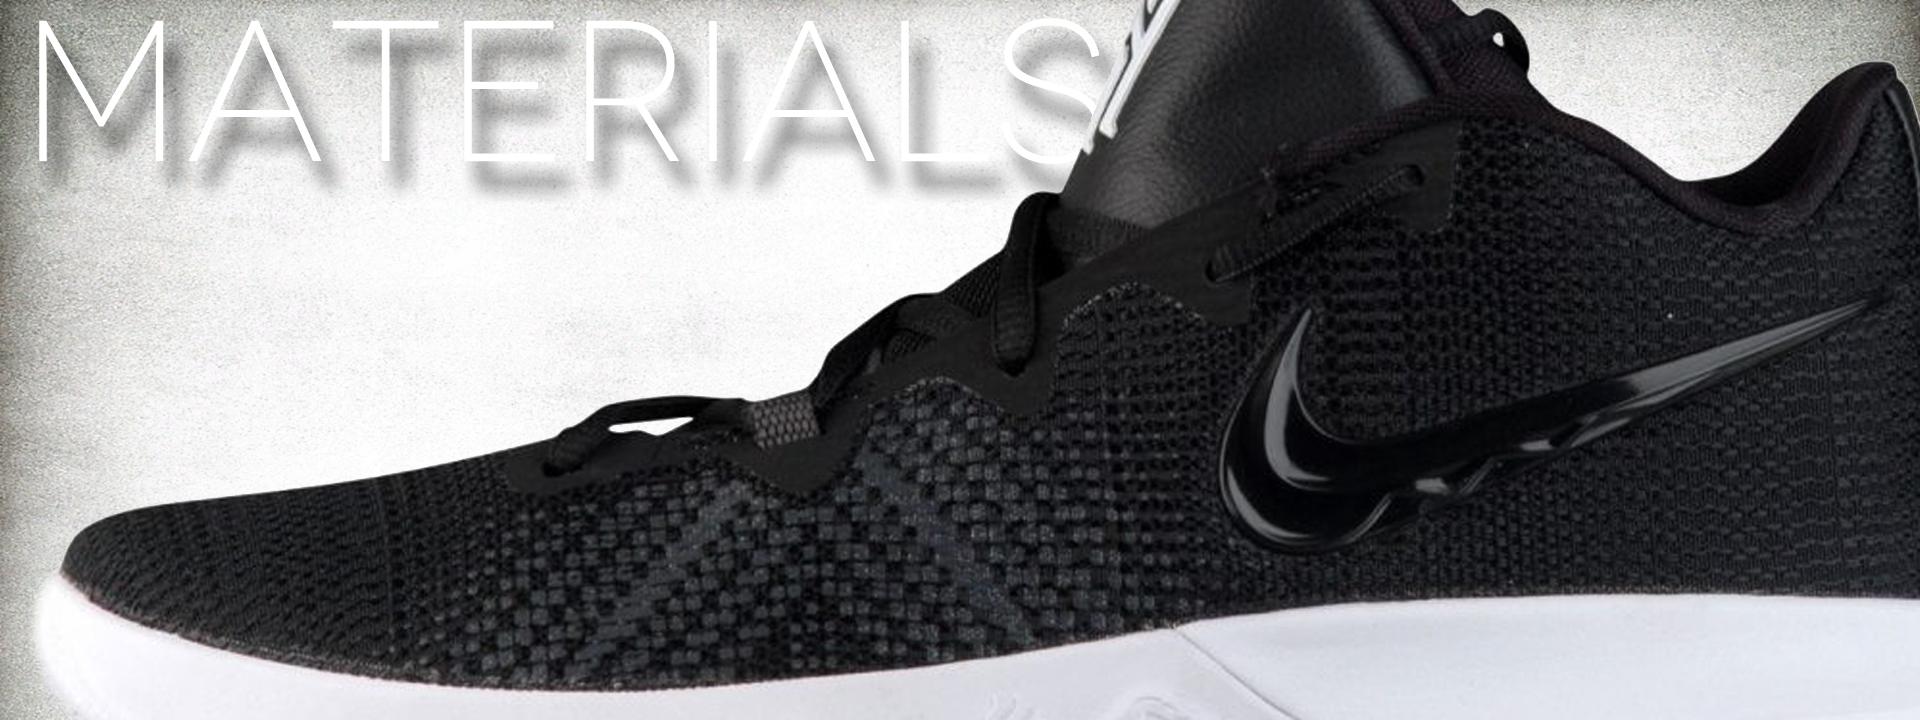 Nike Performance Revisar Flytrap El Material Weartesters Kyrie Flytrap Revisar 7c0cd1